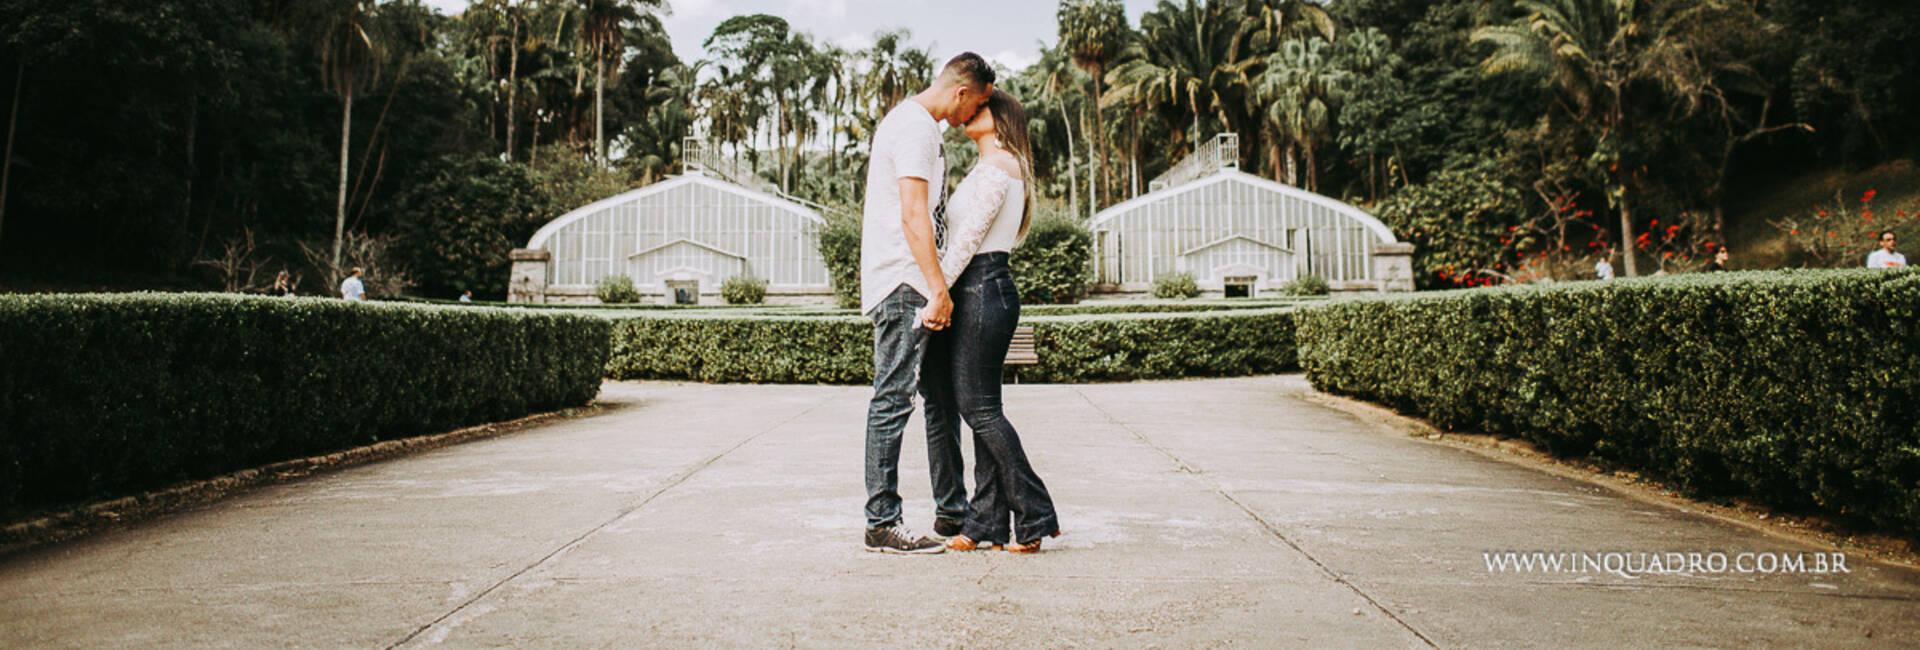 Ensaio Pré Casamento de Nayane e Jefferson